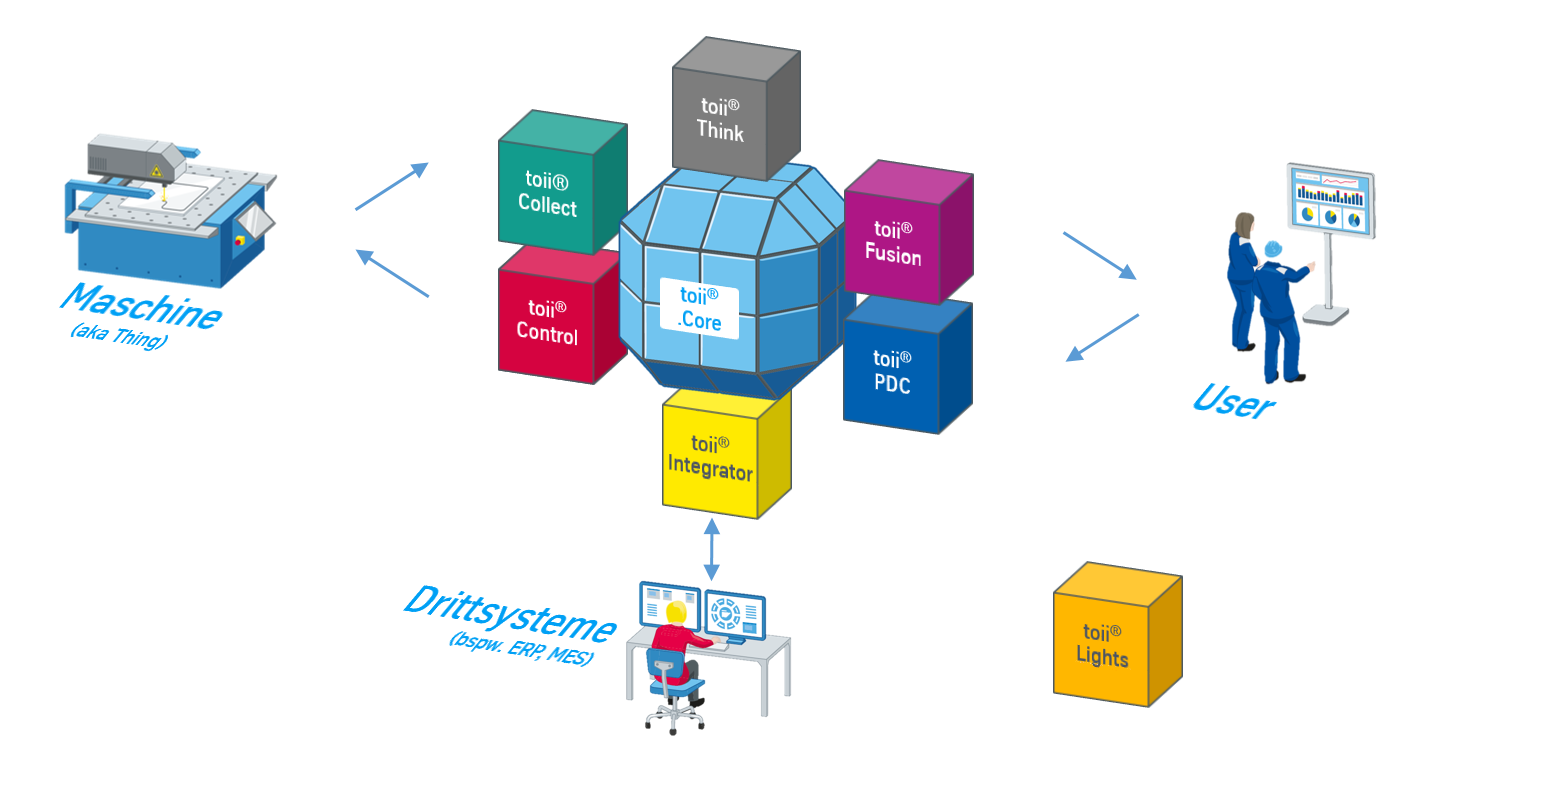 Module, toii, Drittsystem, Integration, User, PDC